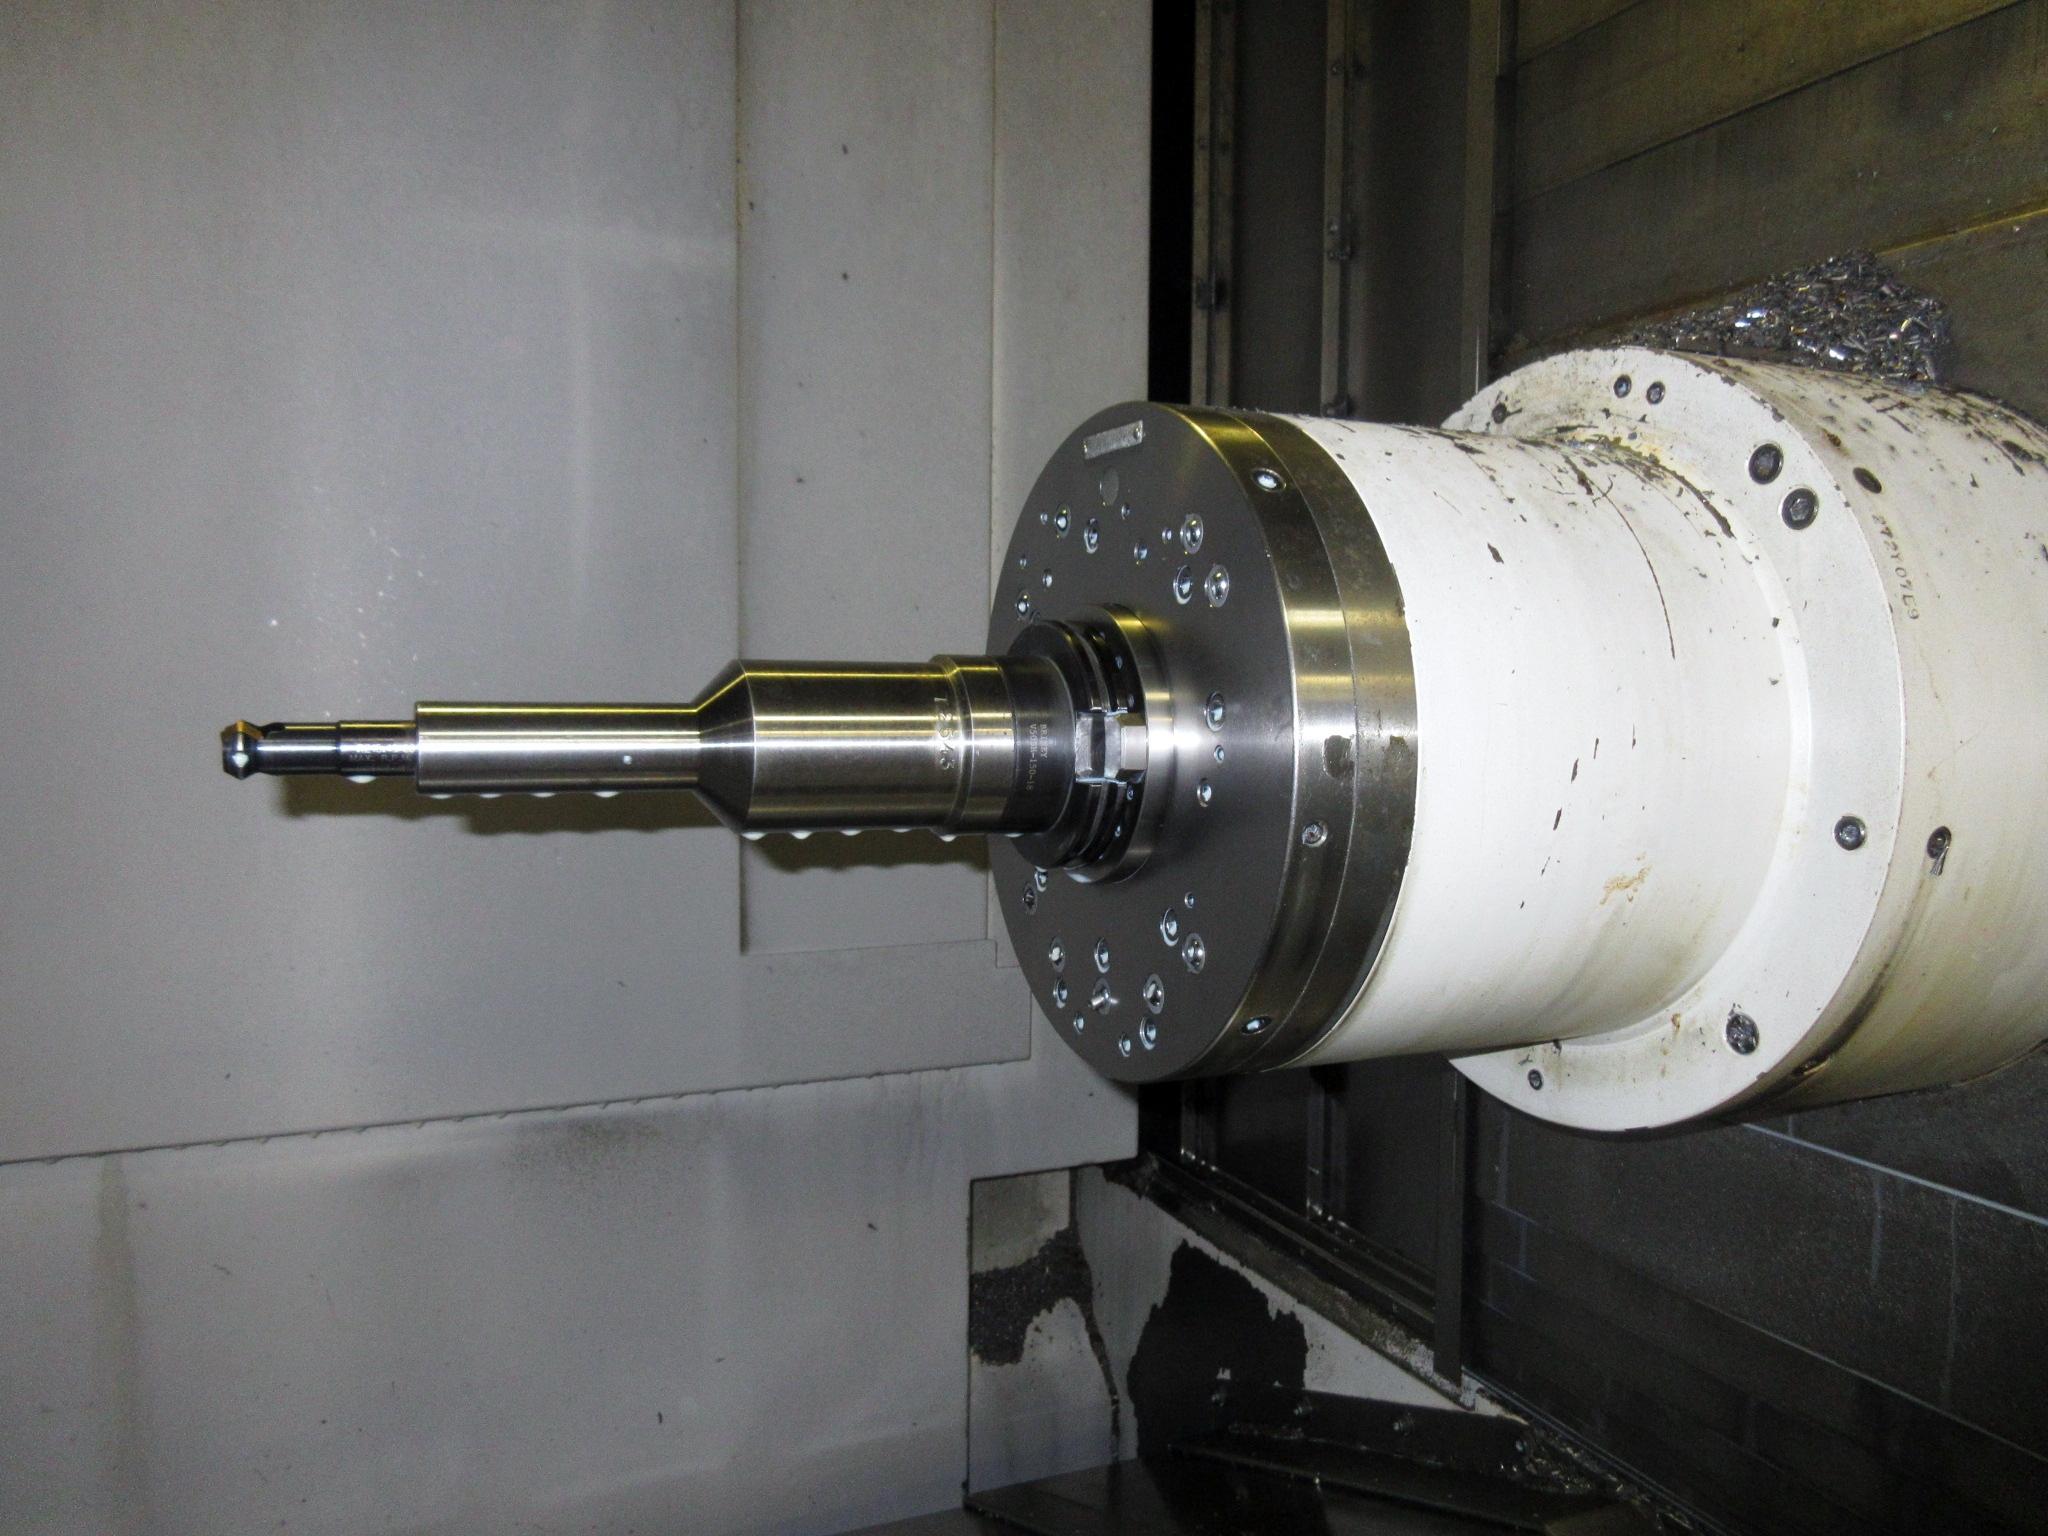 Mazak HCN-6000-II CNC Horizontal Machining Center With Palletech System - Image 6 of 22